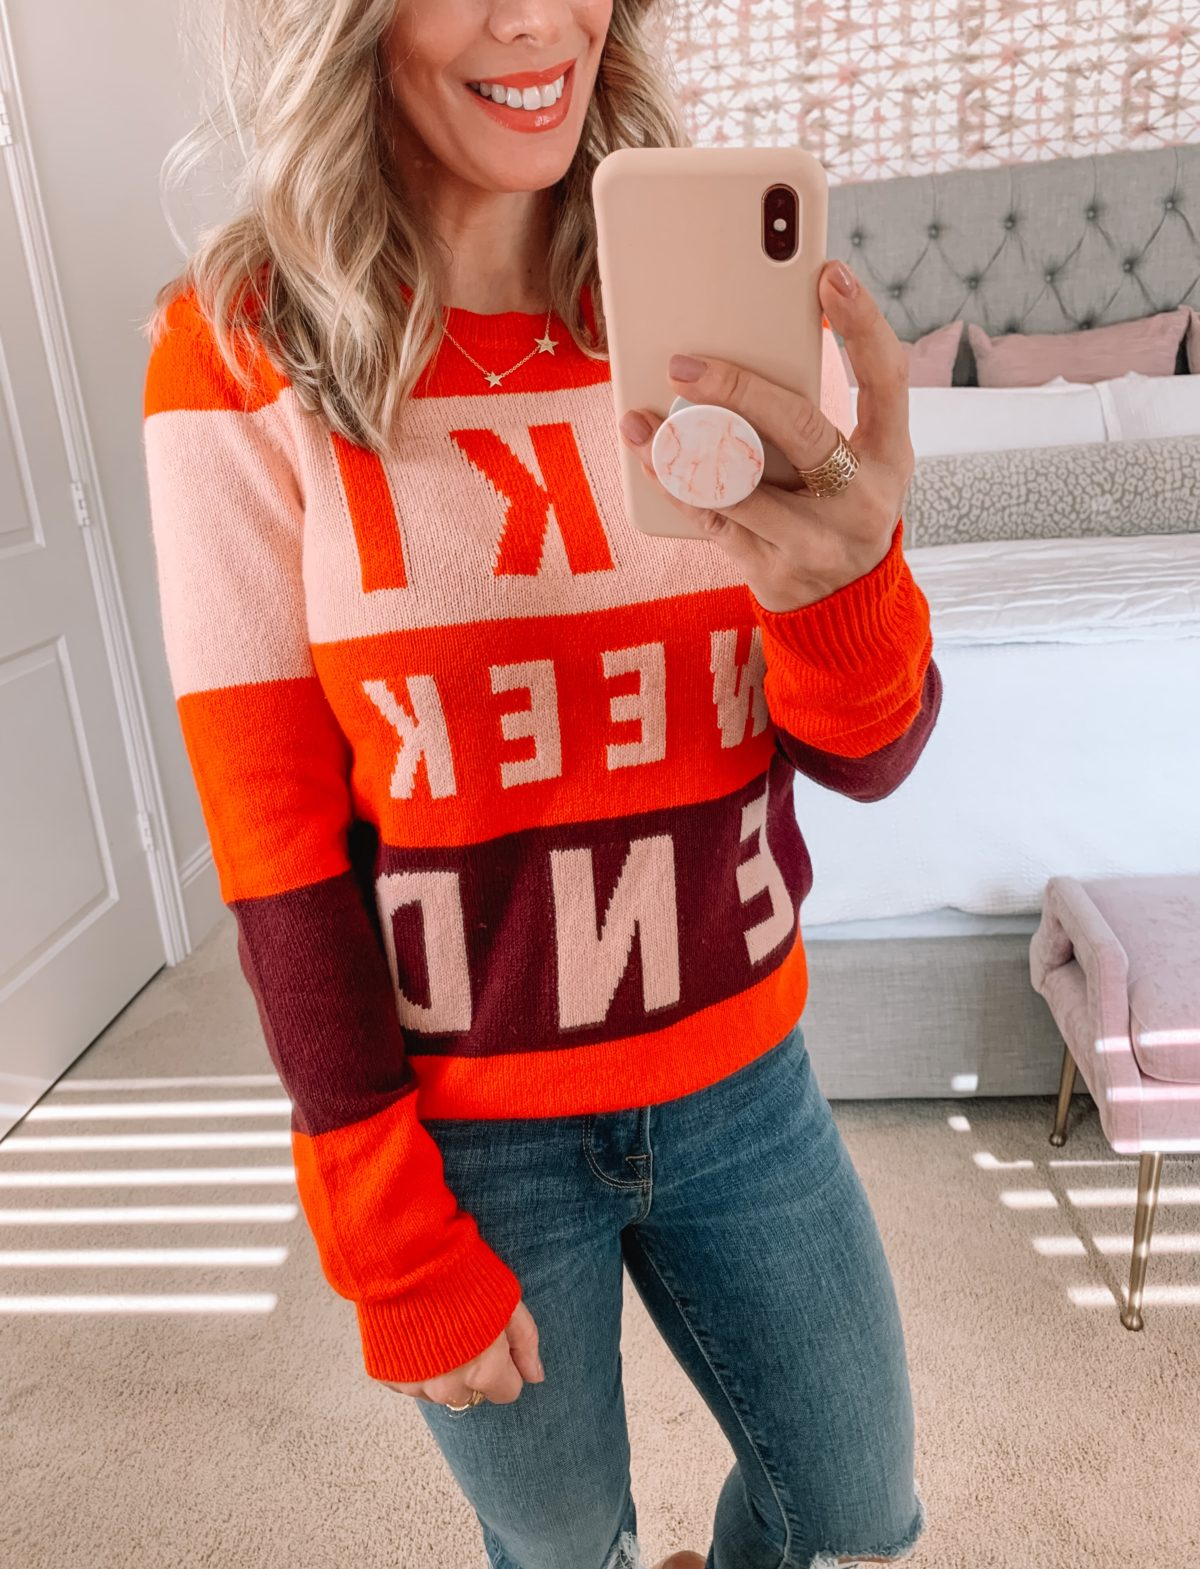 Dressing Room try on Nordstrom, Ski Weekend Sweater, Jeans, Booties